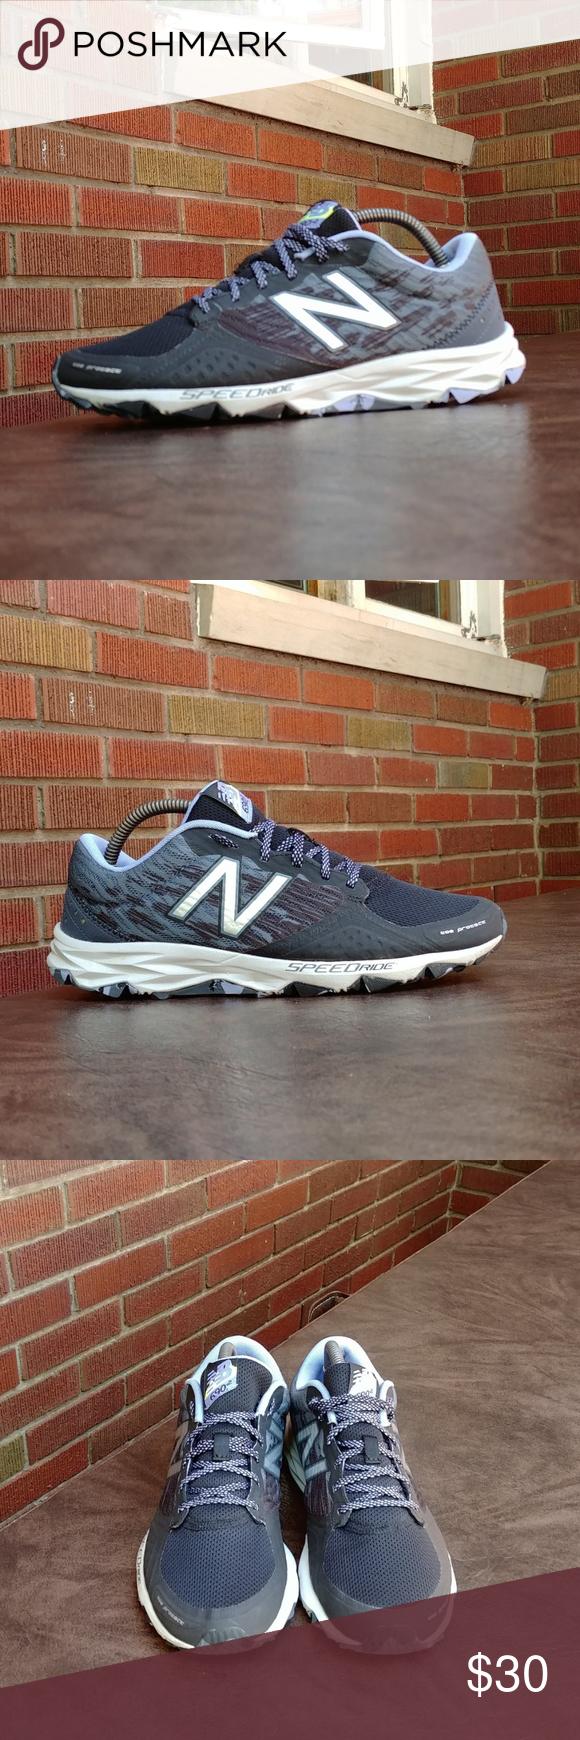 New balance 690 v2 trail running shoes sz 10 Trail